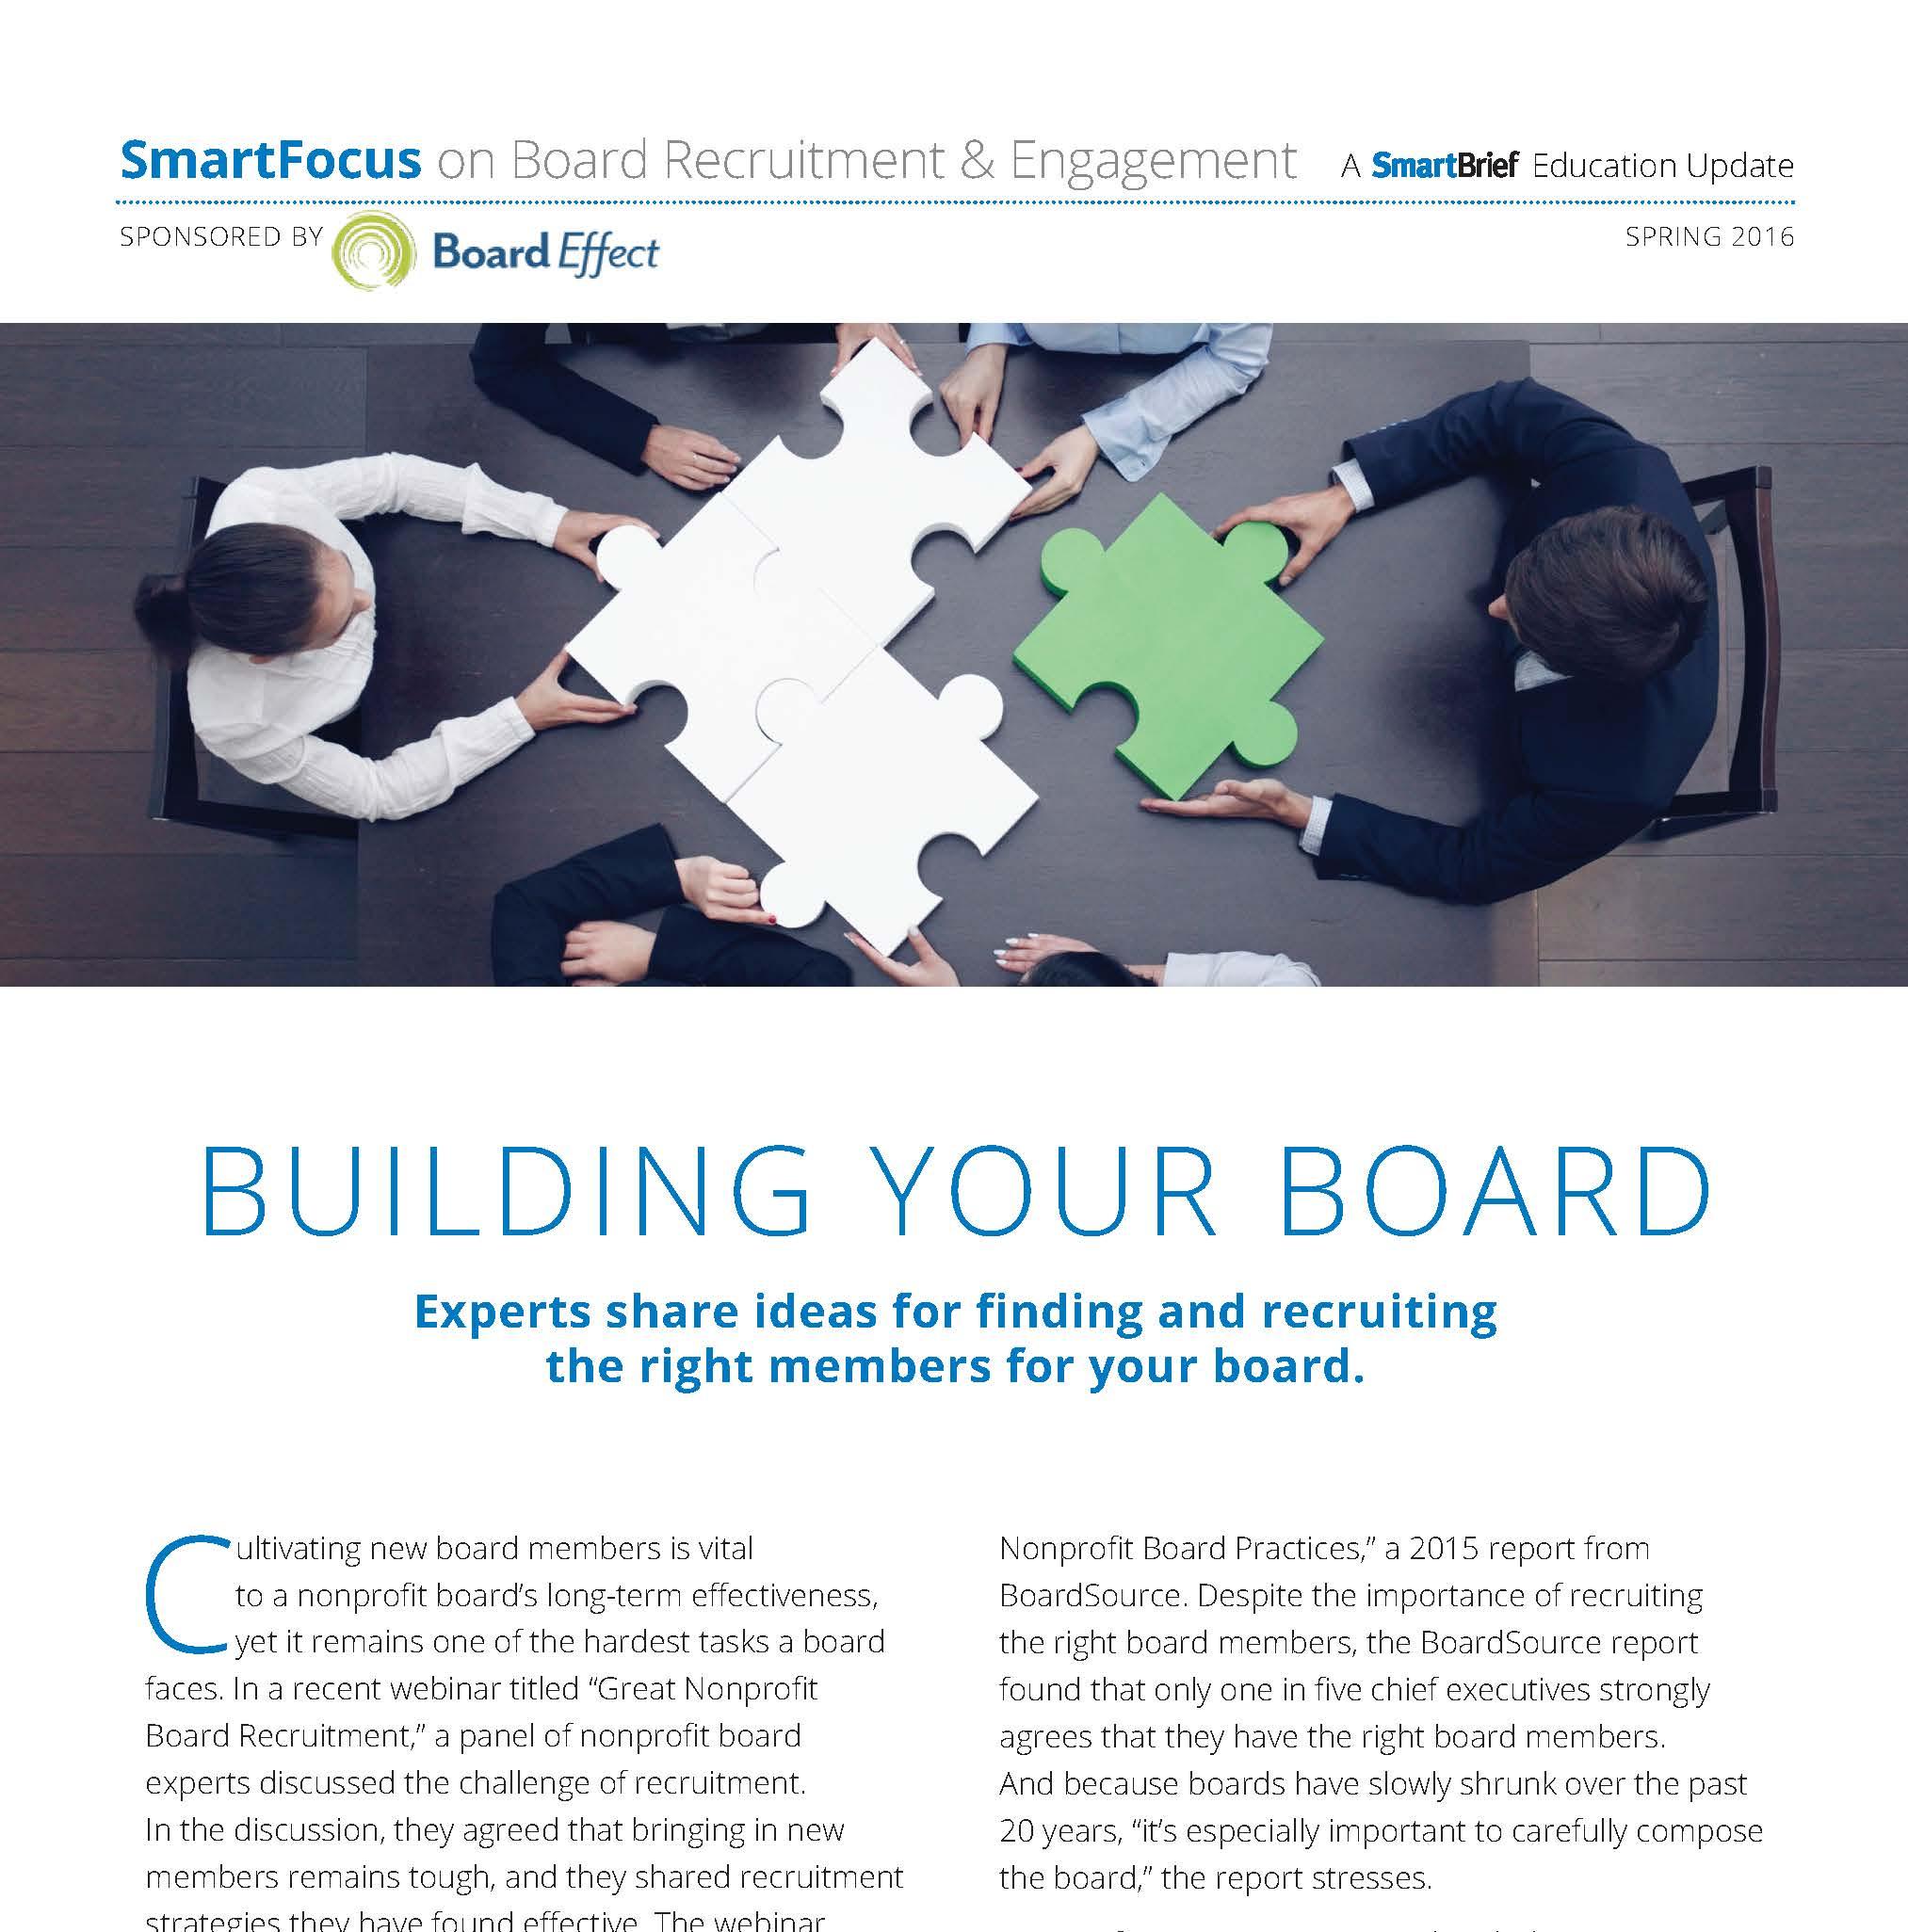 Building Your Board A Board Recruitment Guide Boardeffect